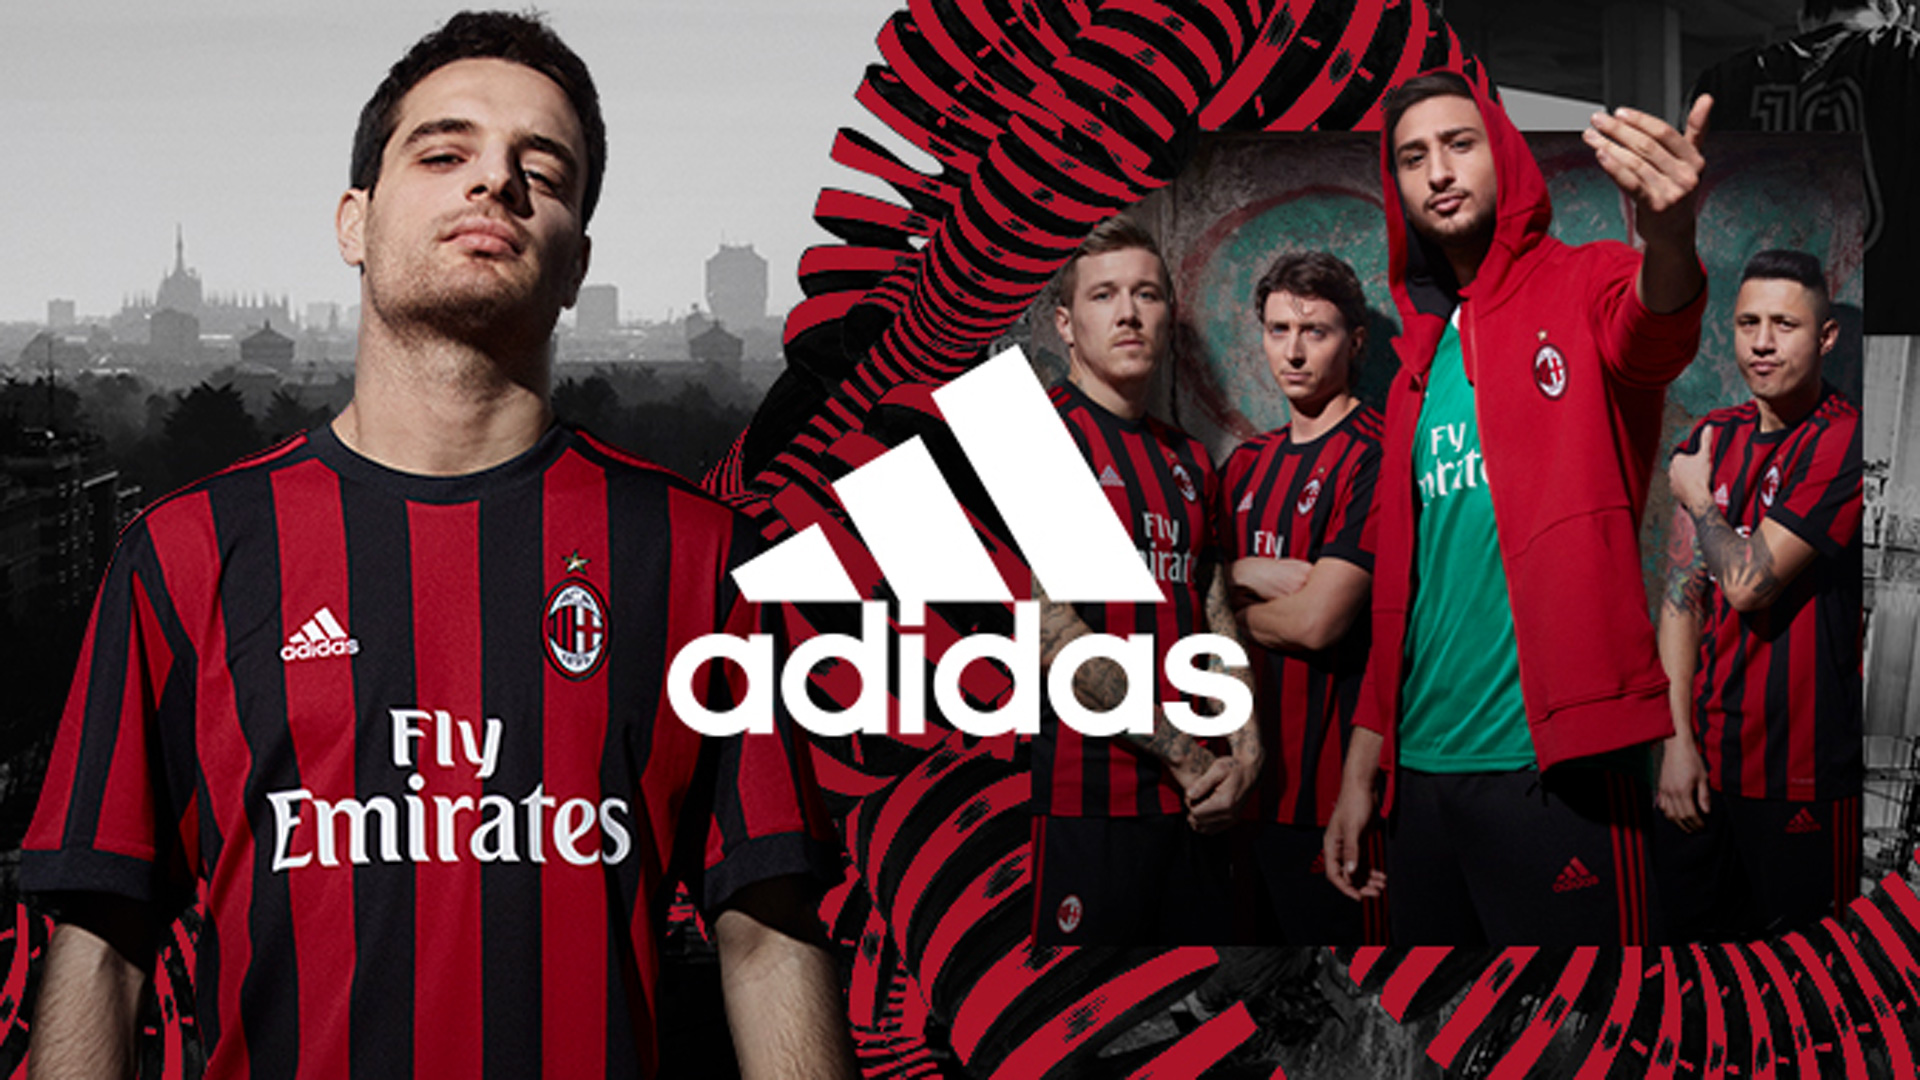 Adidas punta sulla Juve e lascia il Milan